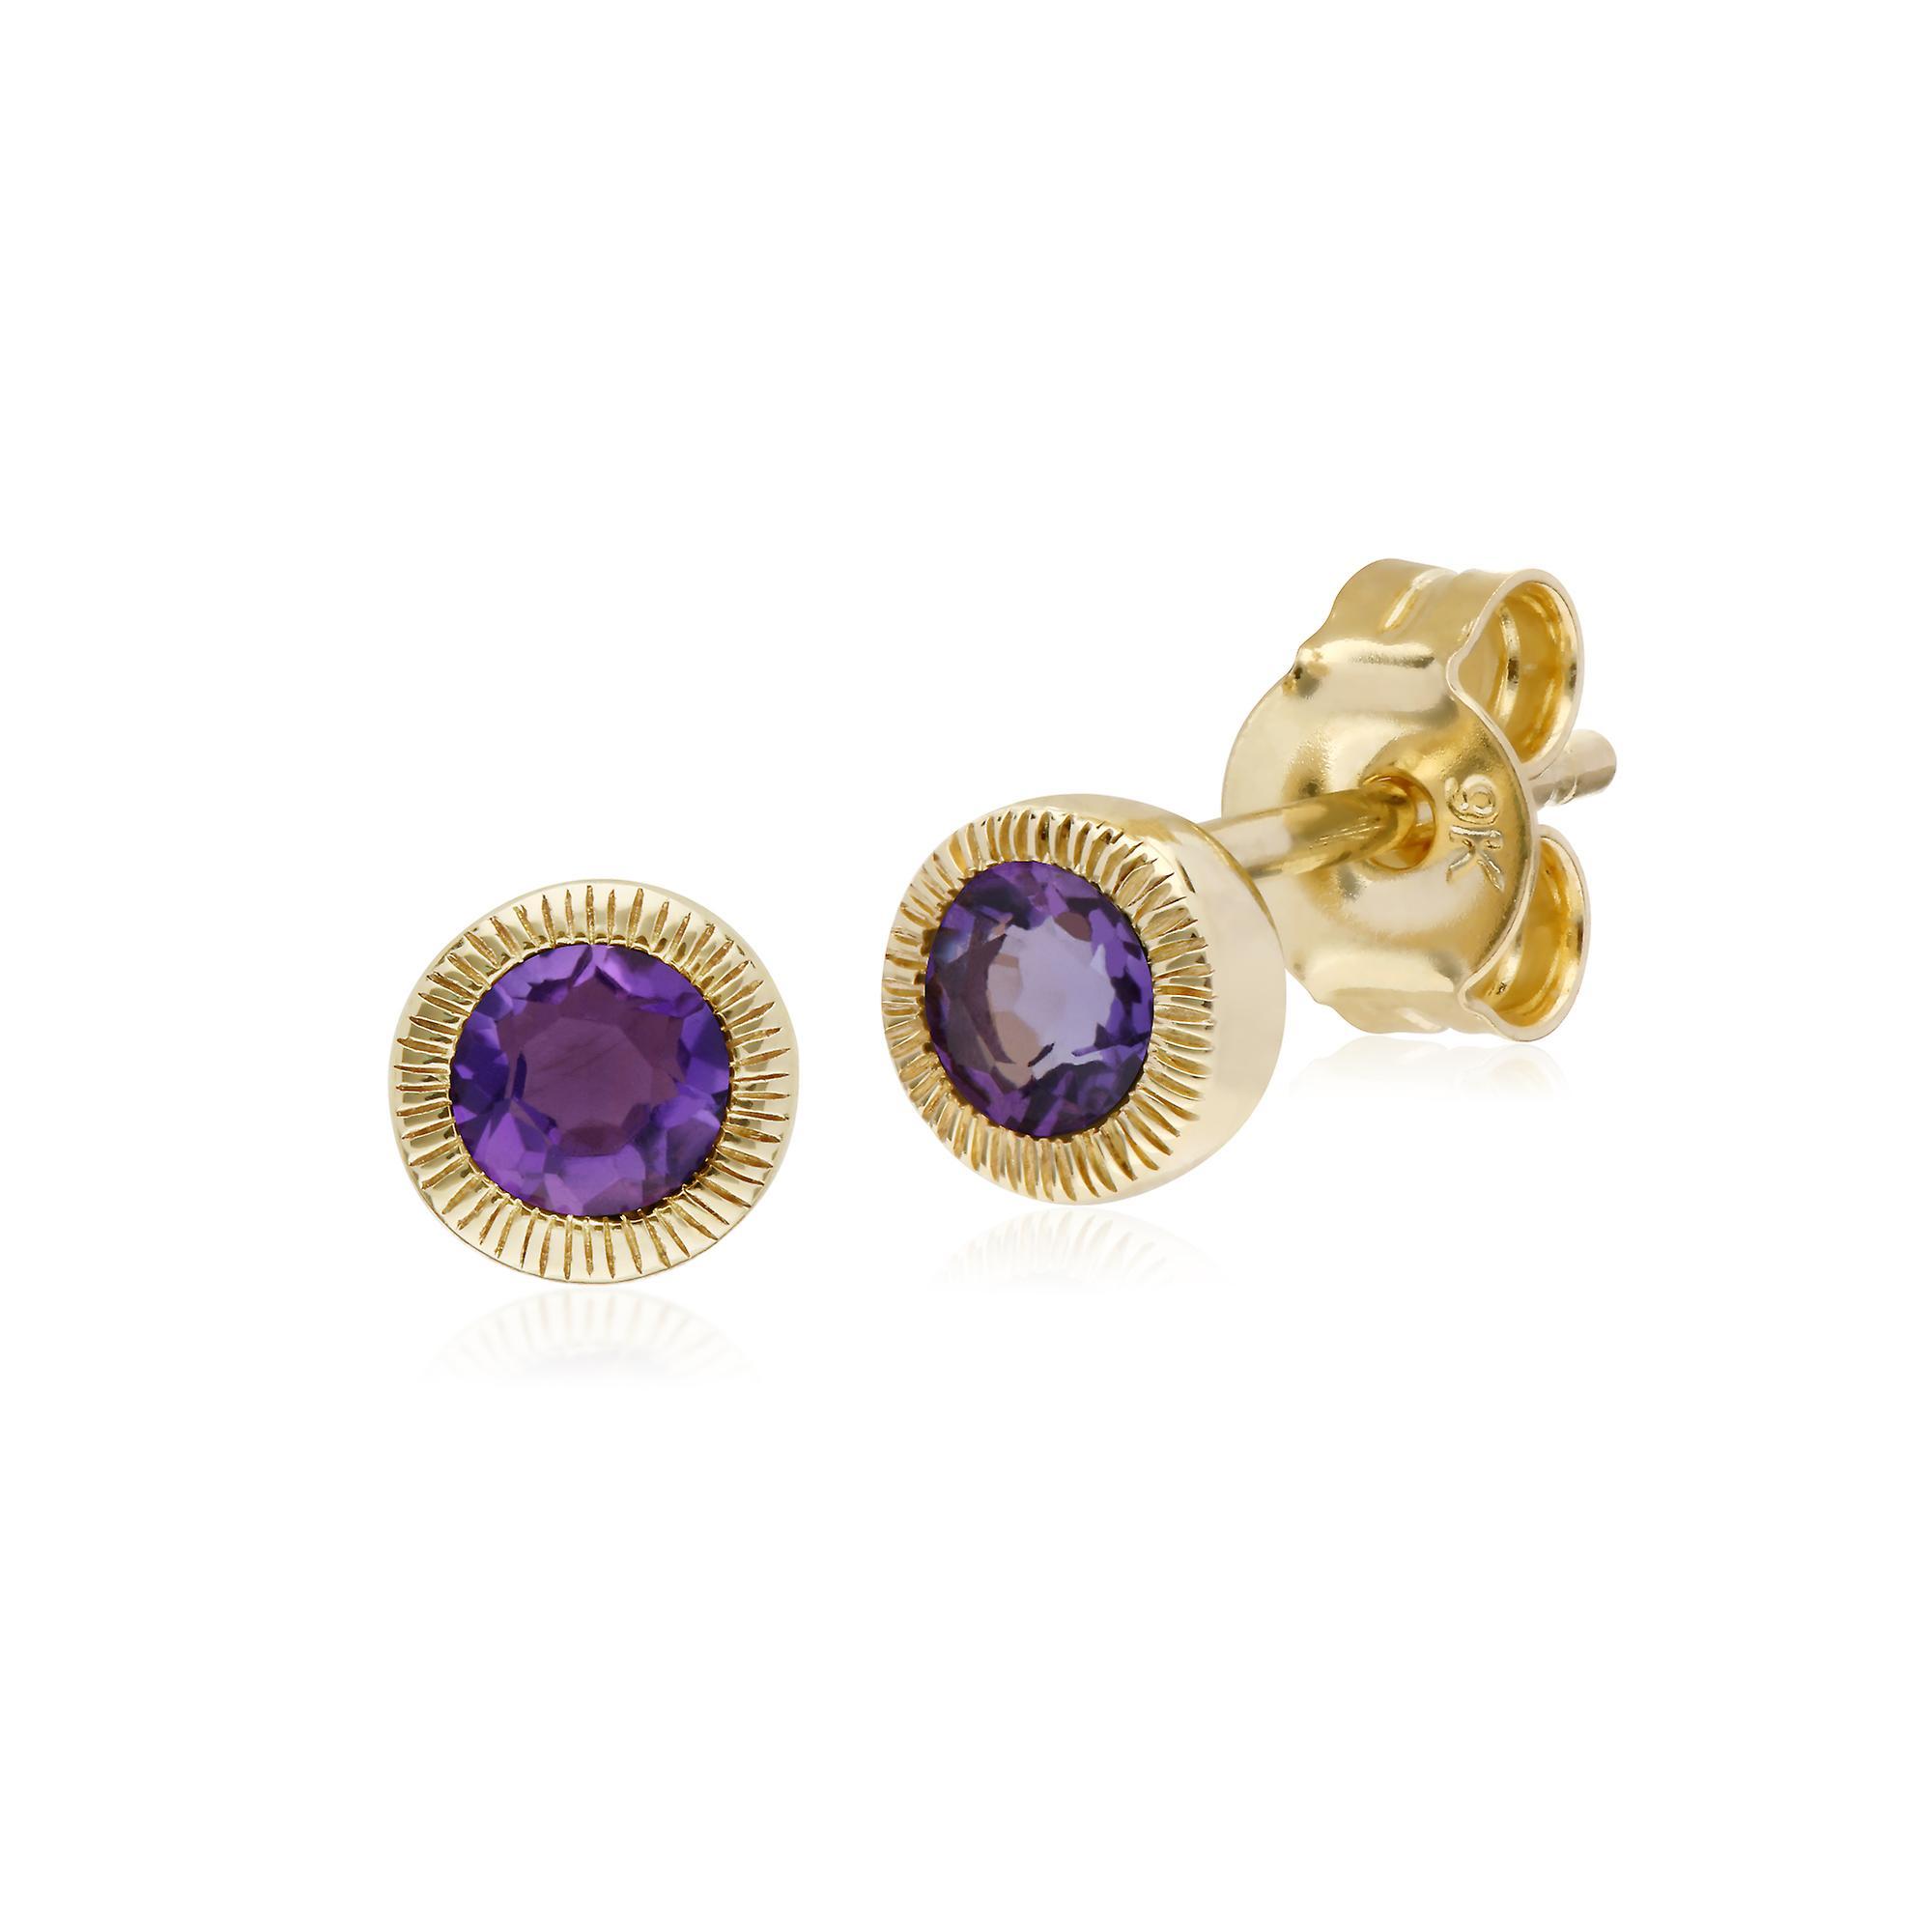 Gemondo 9ct Yellow Gold Amethyst Single Stone Round Milgrain Stud Earrings